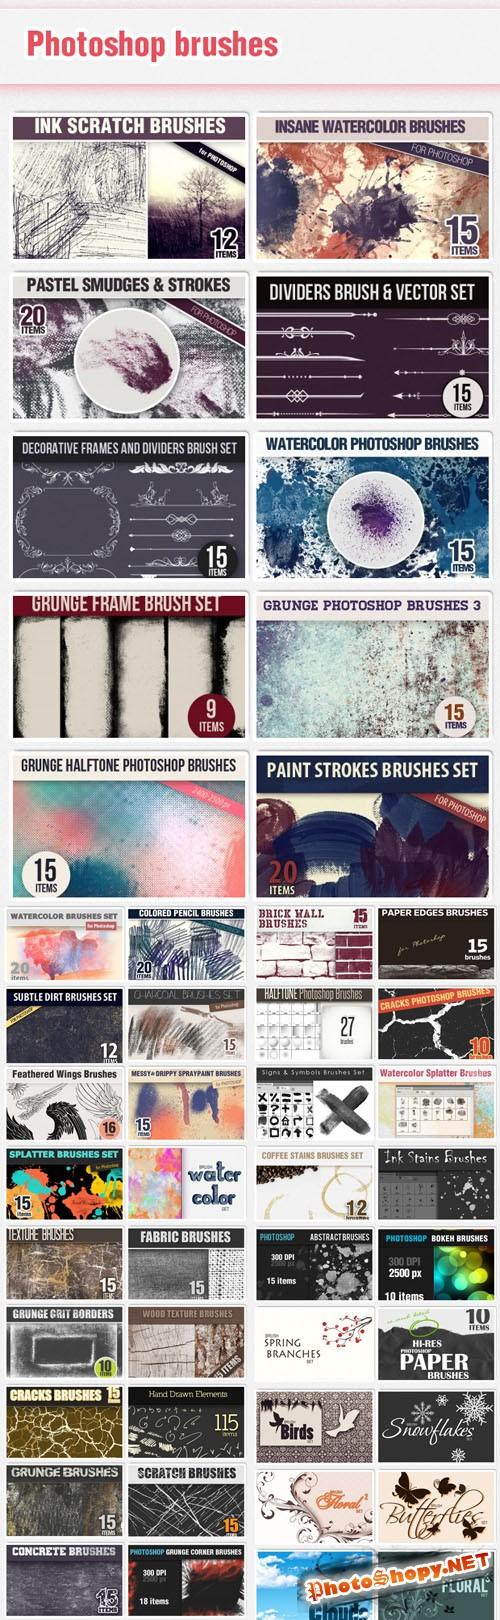 49 Premium Brushes Sets from DesignTNT